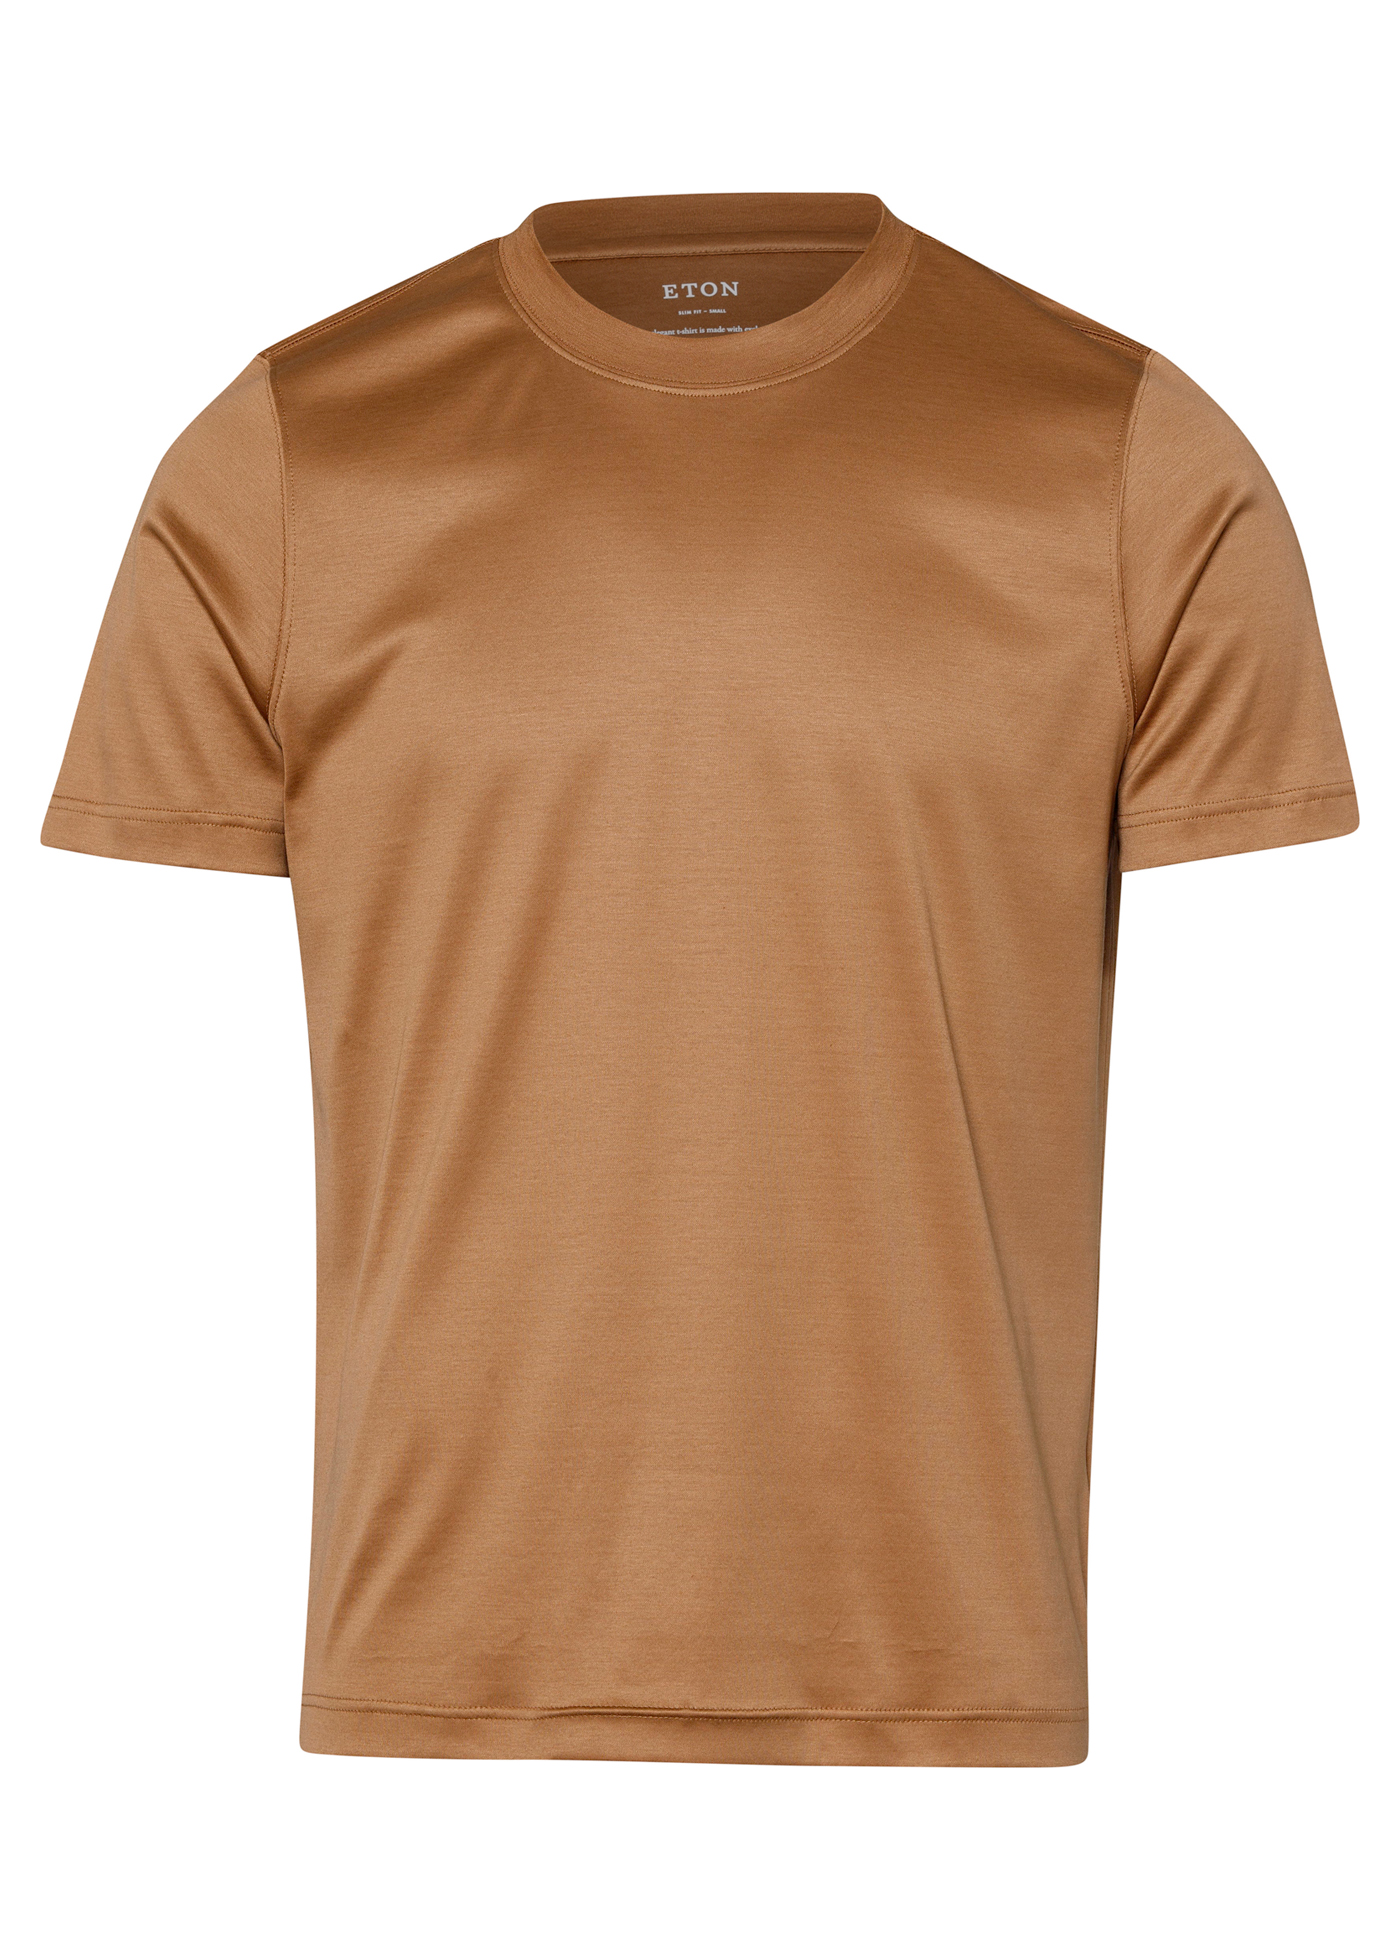 1000023563209 Men shirt: Casual / Jersey image number 0